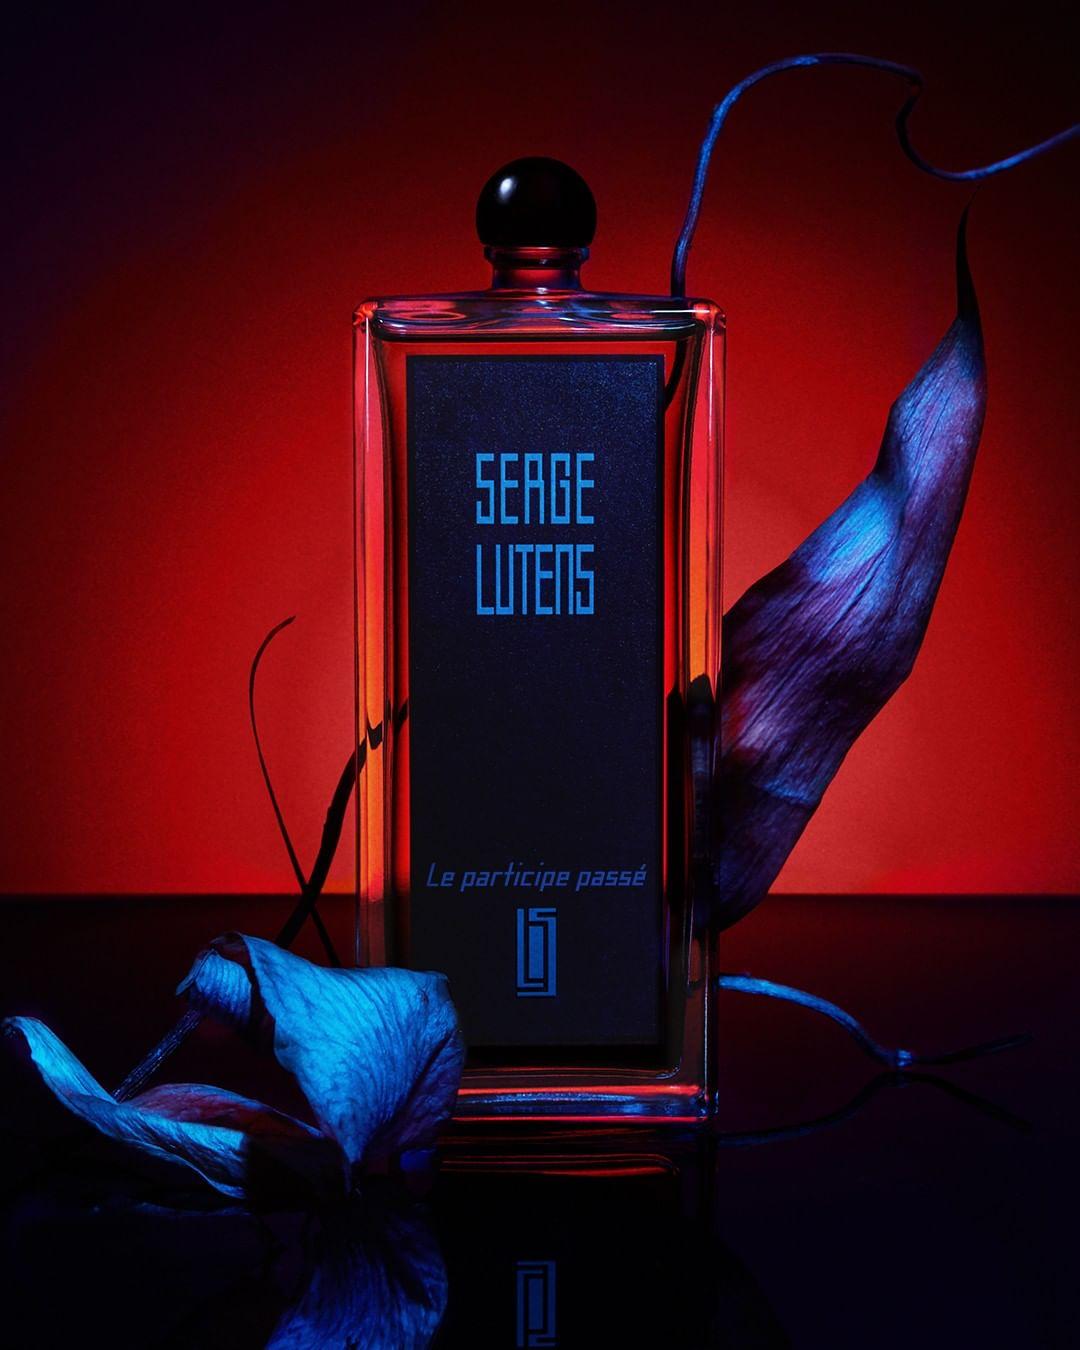 Serge Lutens Le Participe Passe – Ấu thơ trong tôi là…